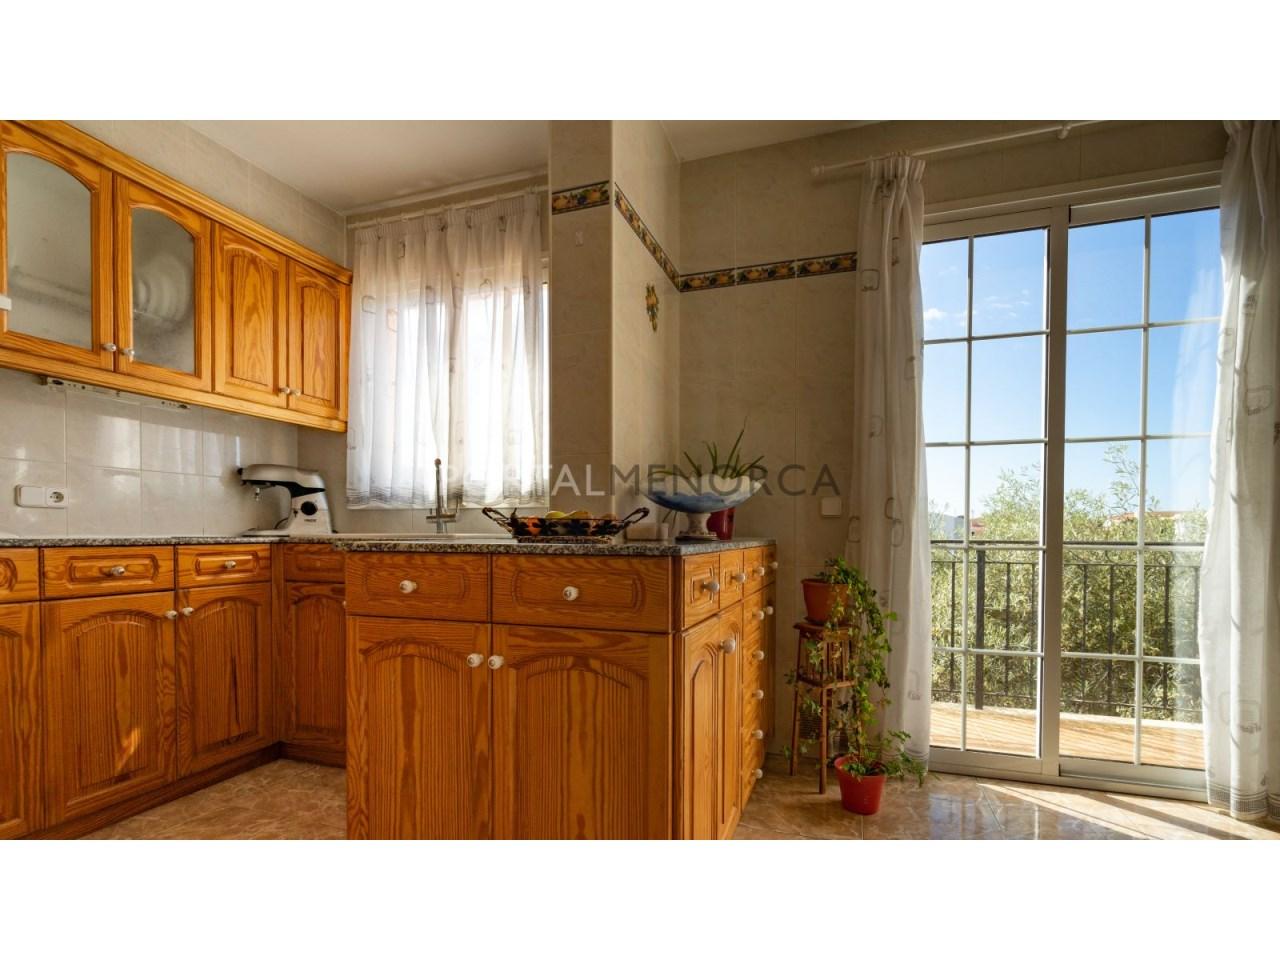 acheter-maison-alaior-menorca (4)